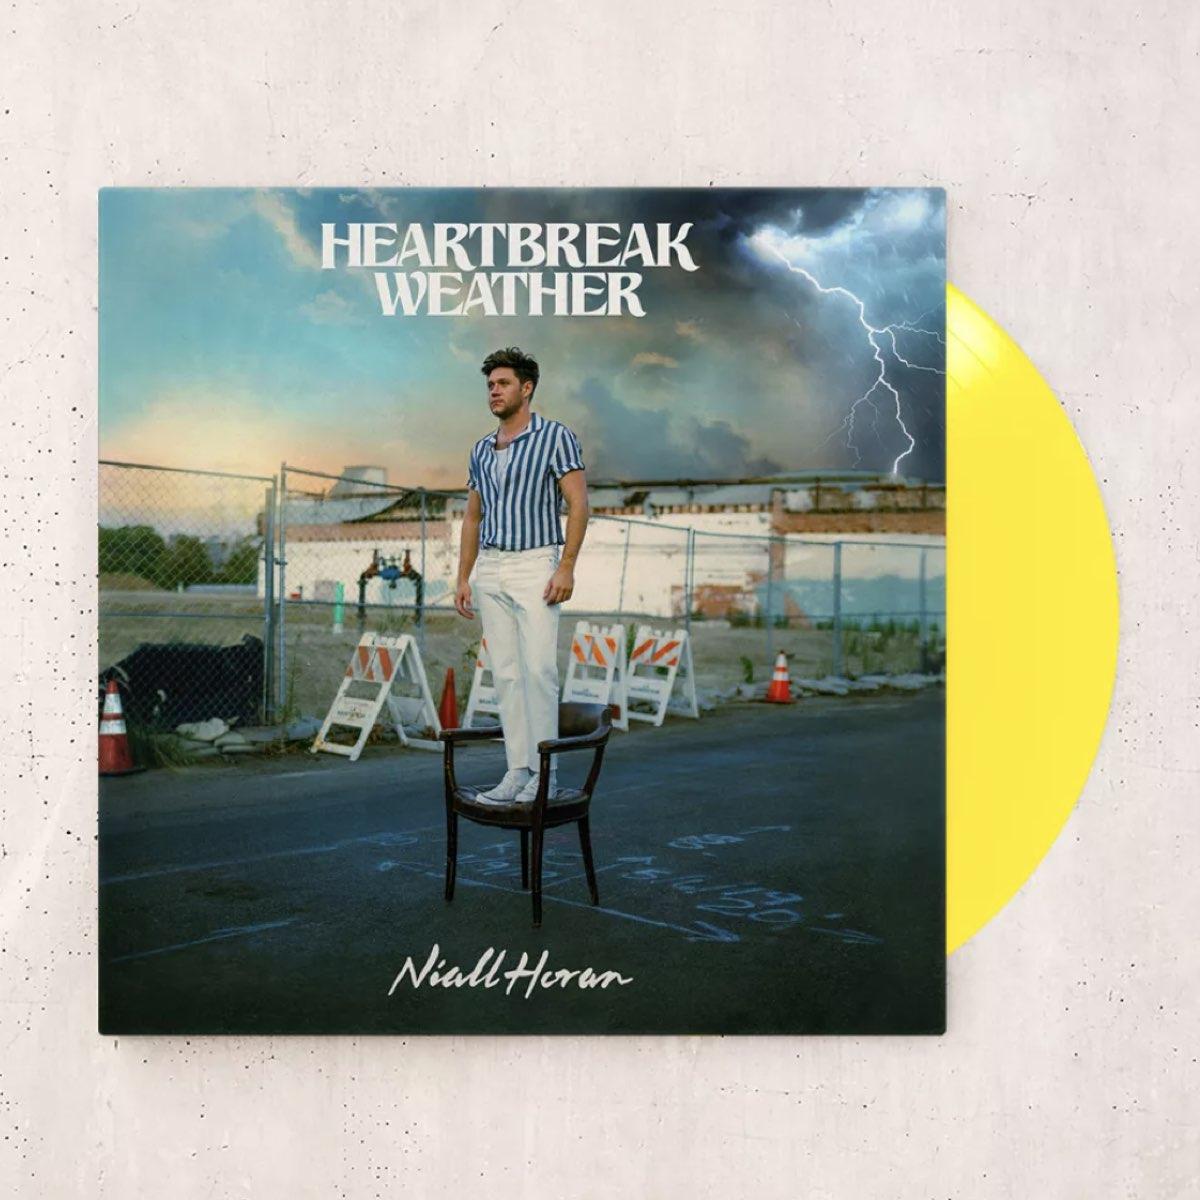 Niall Horan - Heartbreak Weather [Limited Yellow Vinyl]